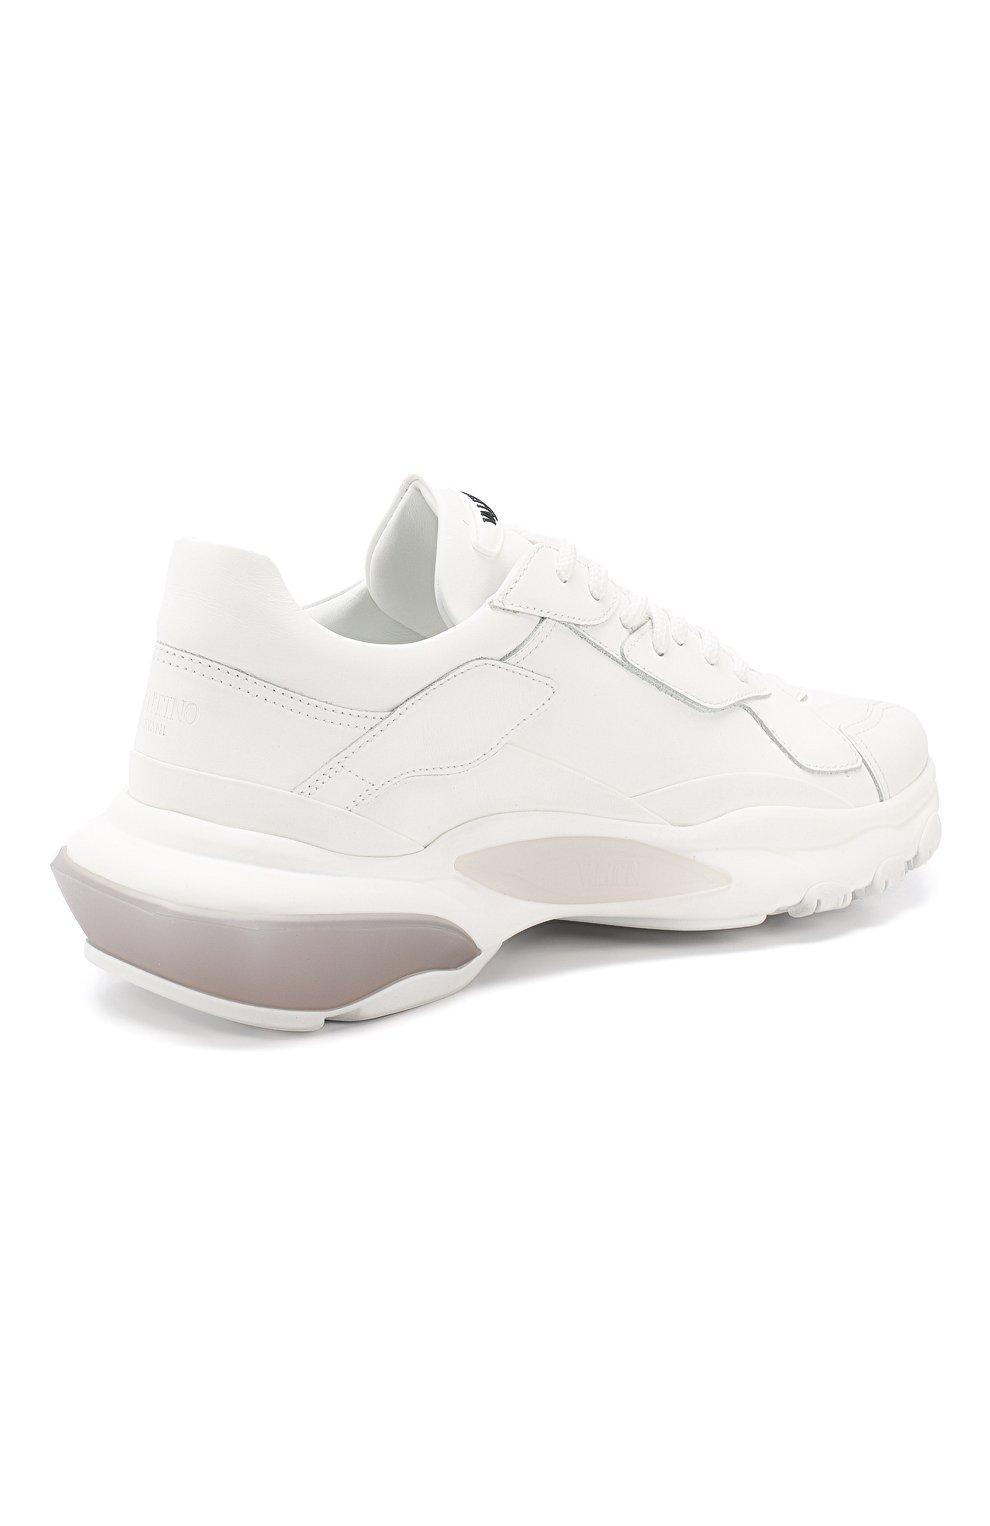 Кожаные кроссовки Valentino Garavani Bounce Valentino белые | Фото №4